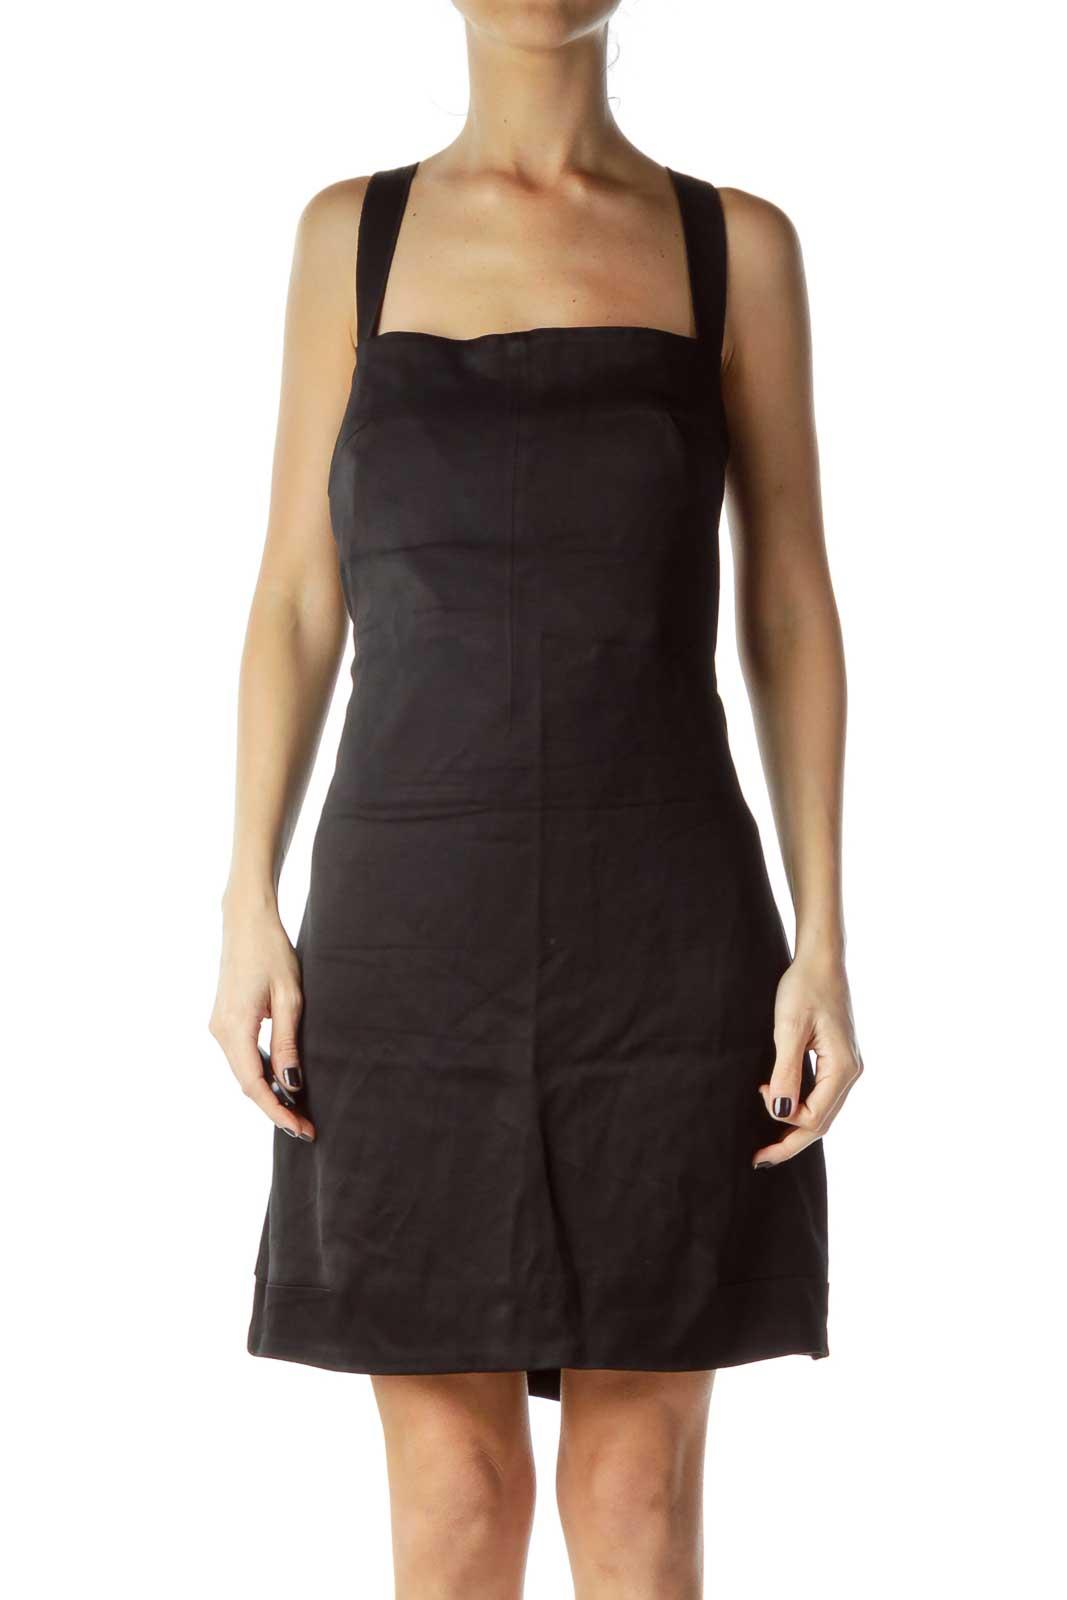 Black Bandage Wrap Cocktail Dress w/ bra inside Front